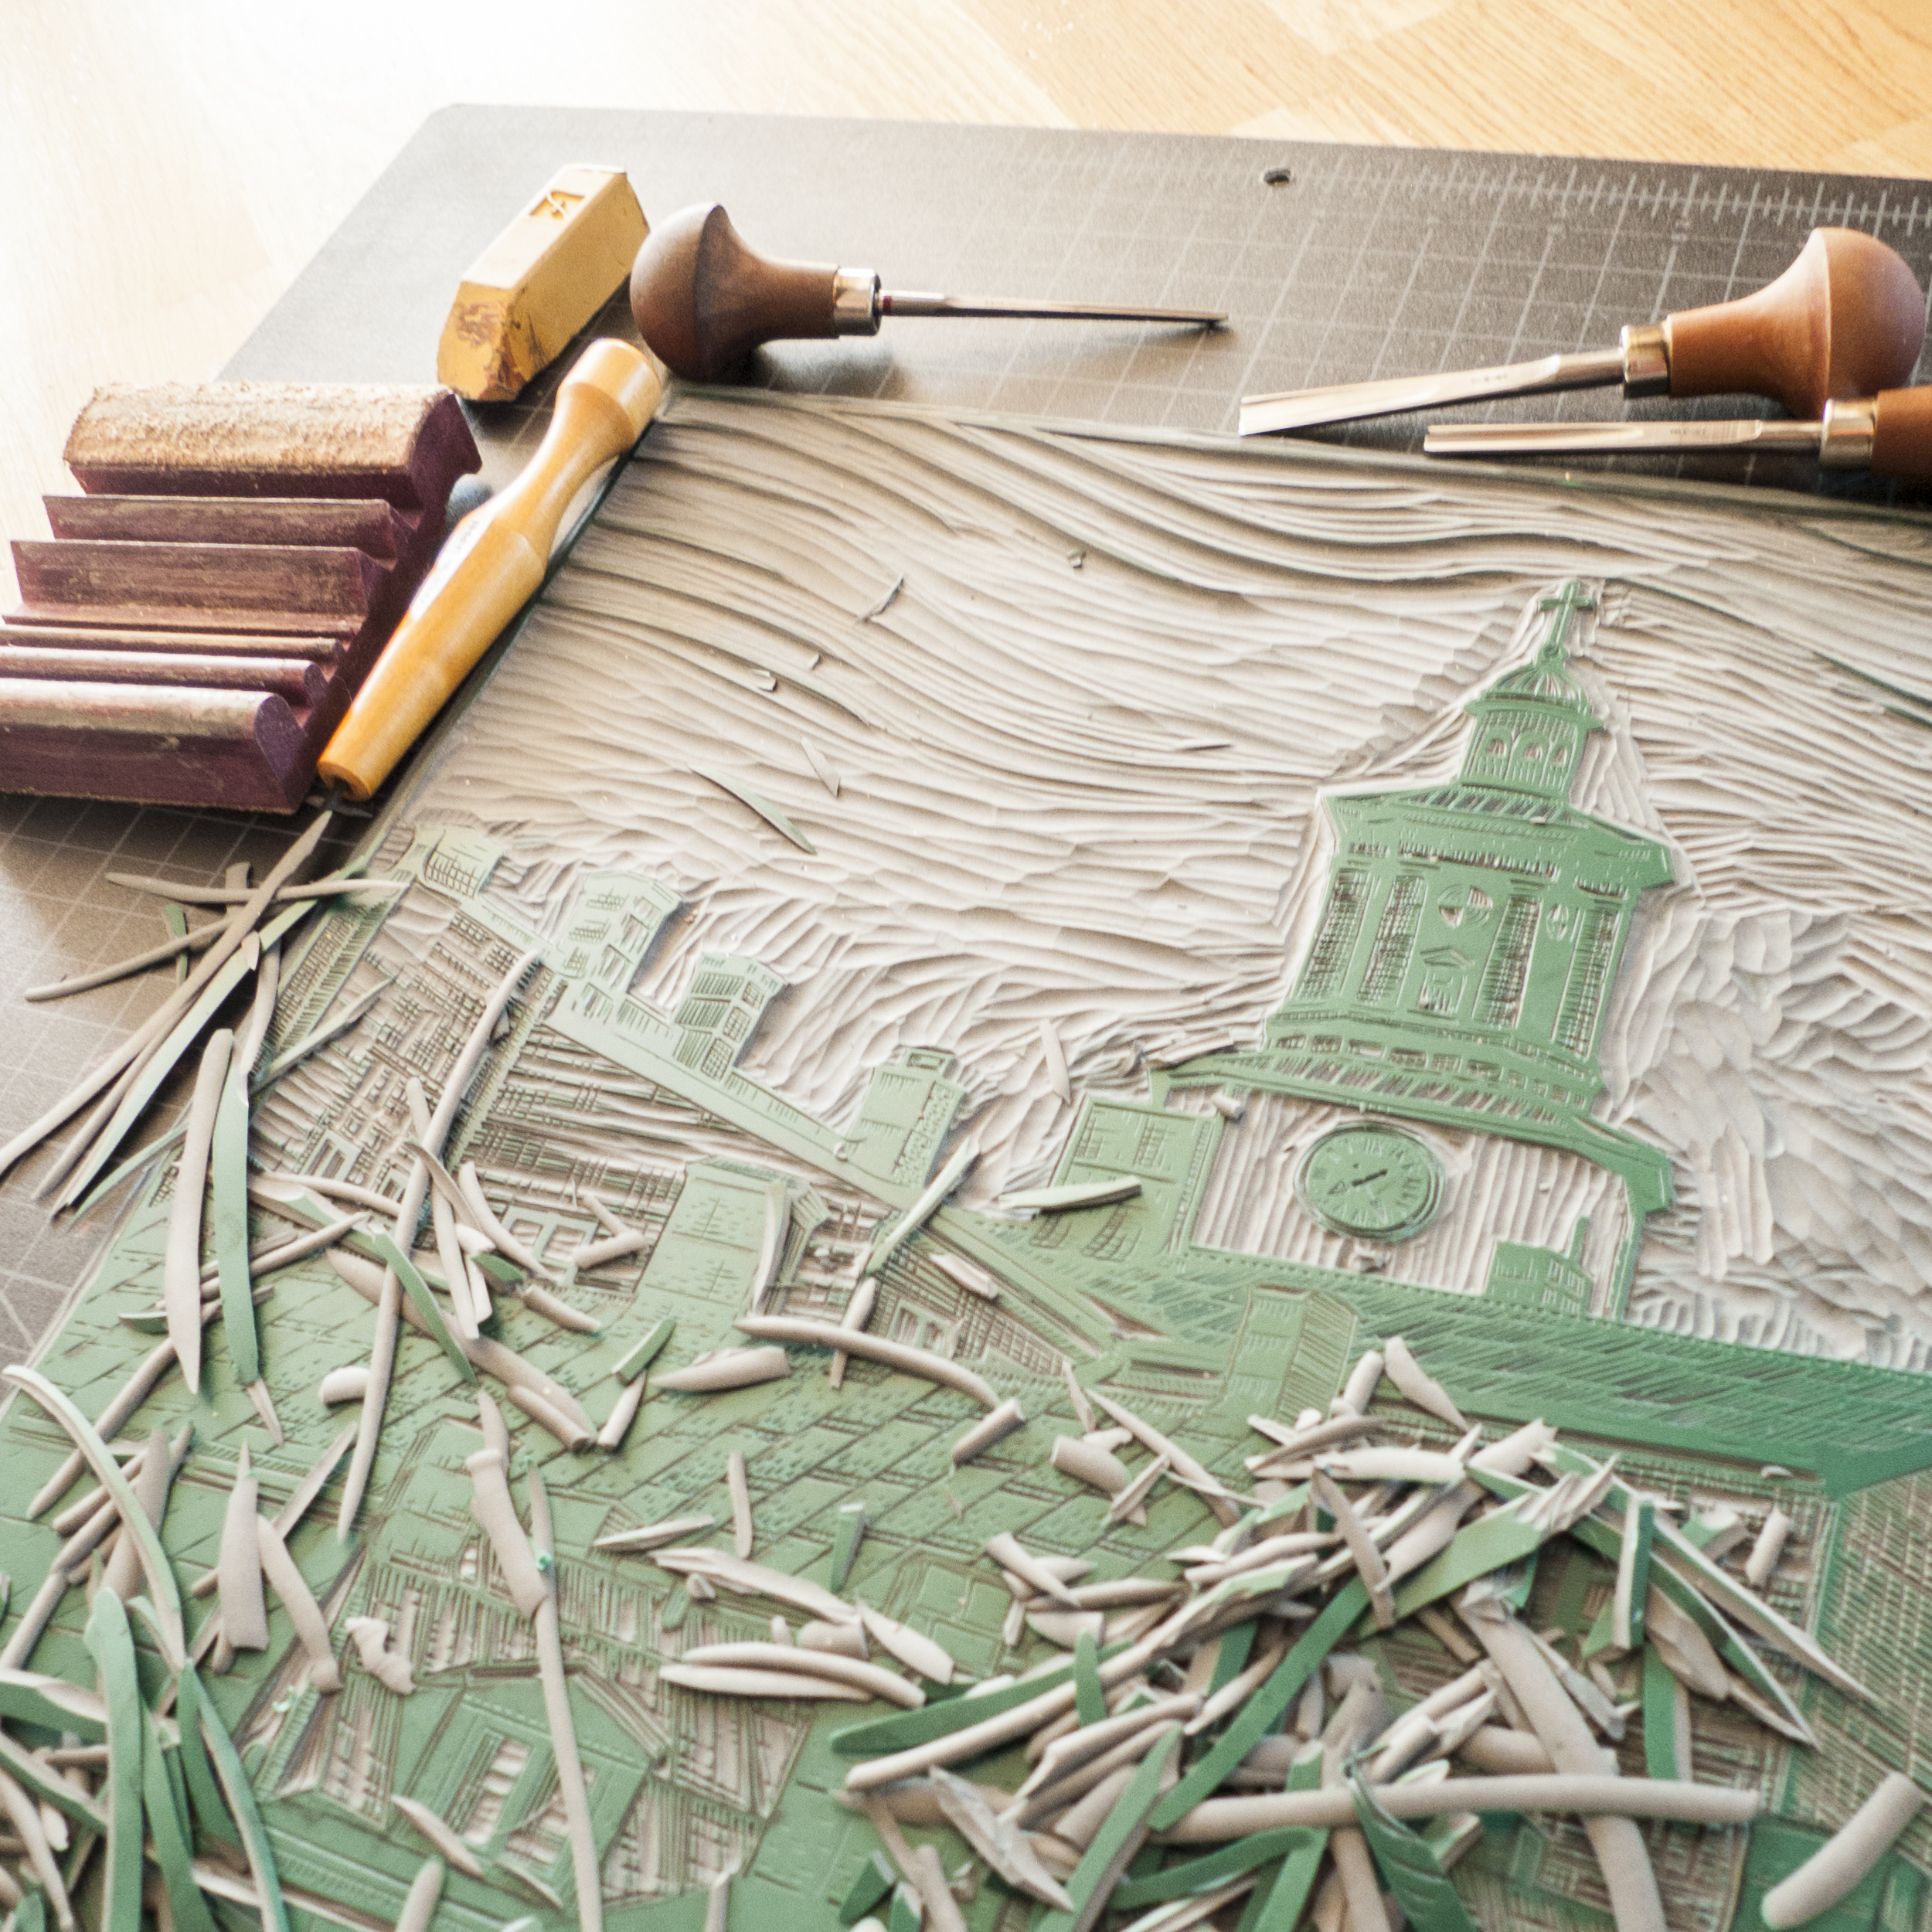 st-maria-magdalena-kyrka-linocut-carving.jpg